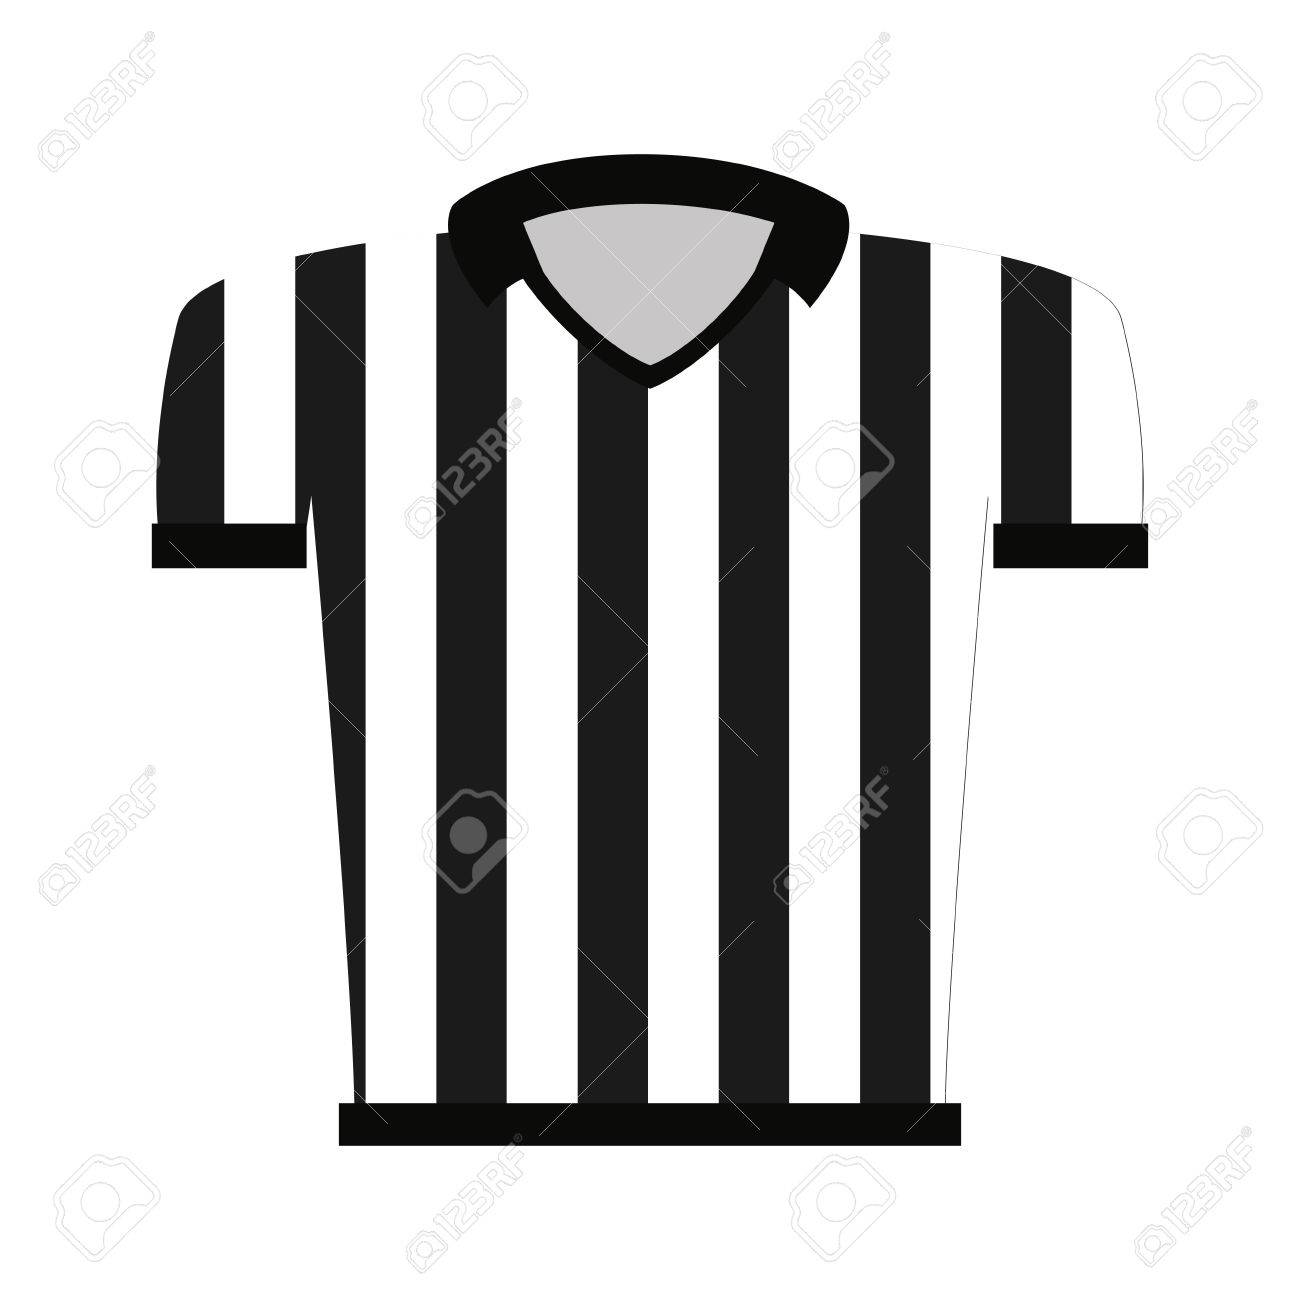 Shirt uniform design vector - Shirt Uniform Referee Icon Vector Illustration Design Stock Vector 60535724